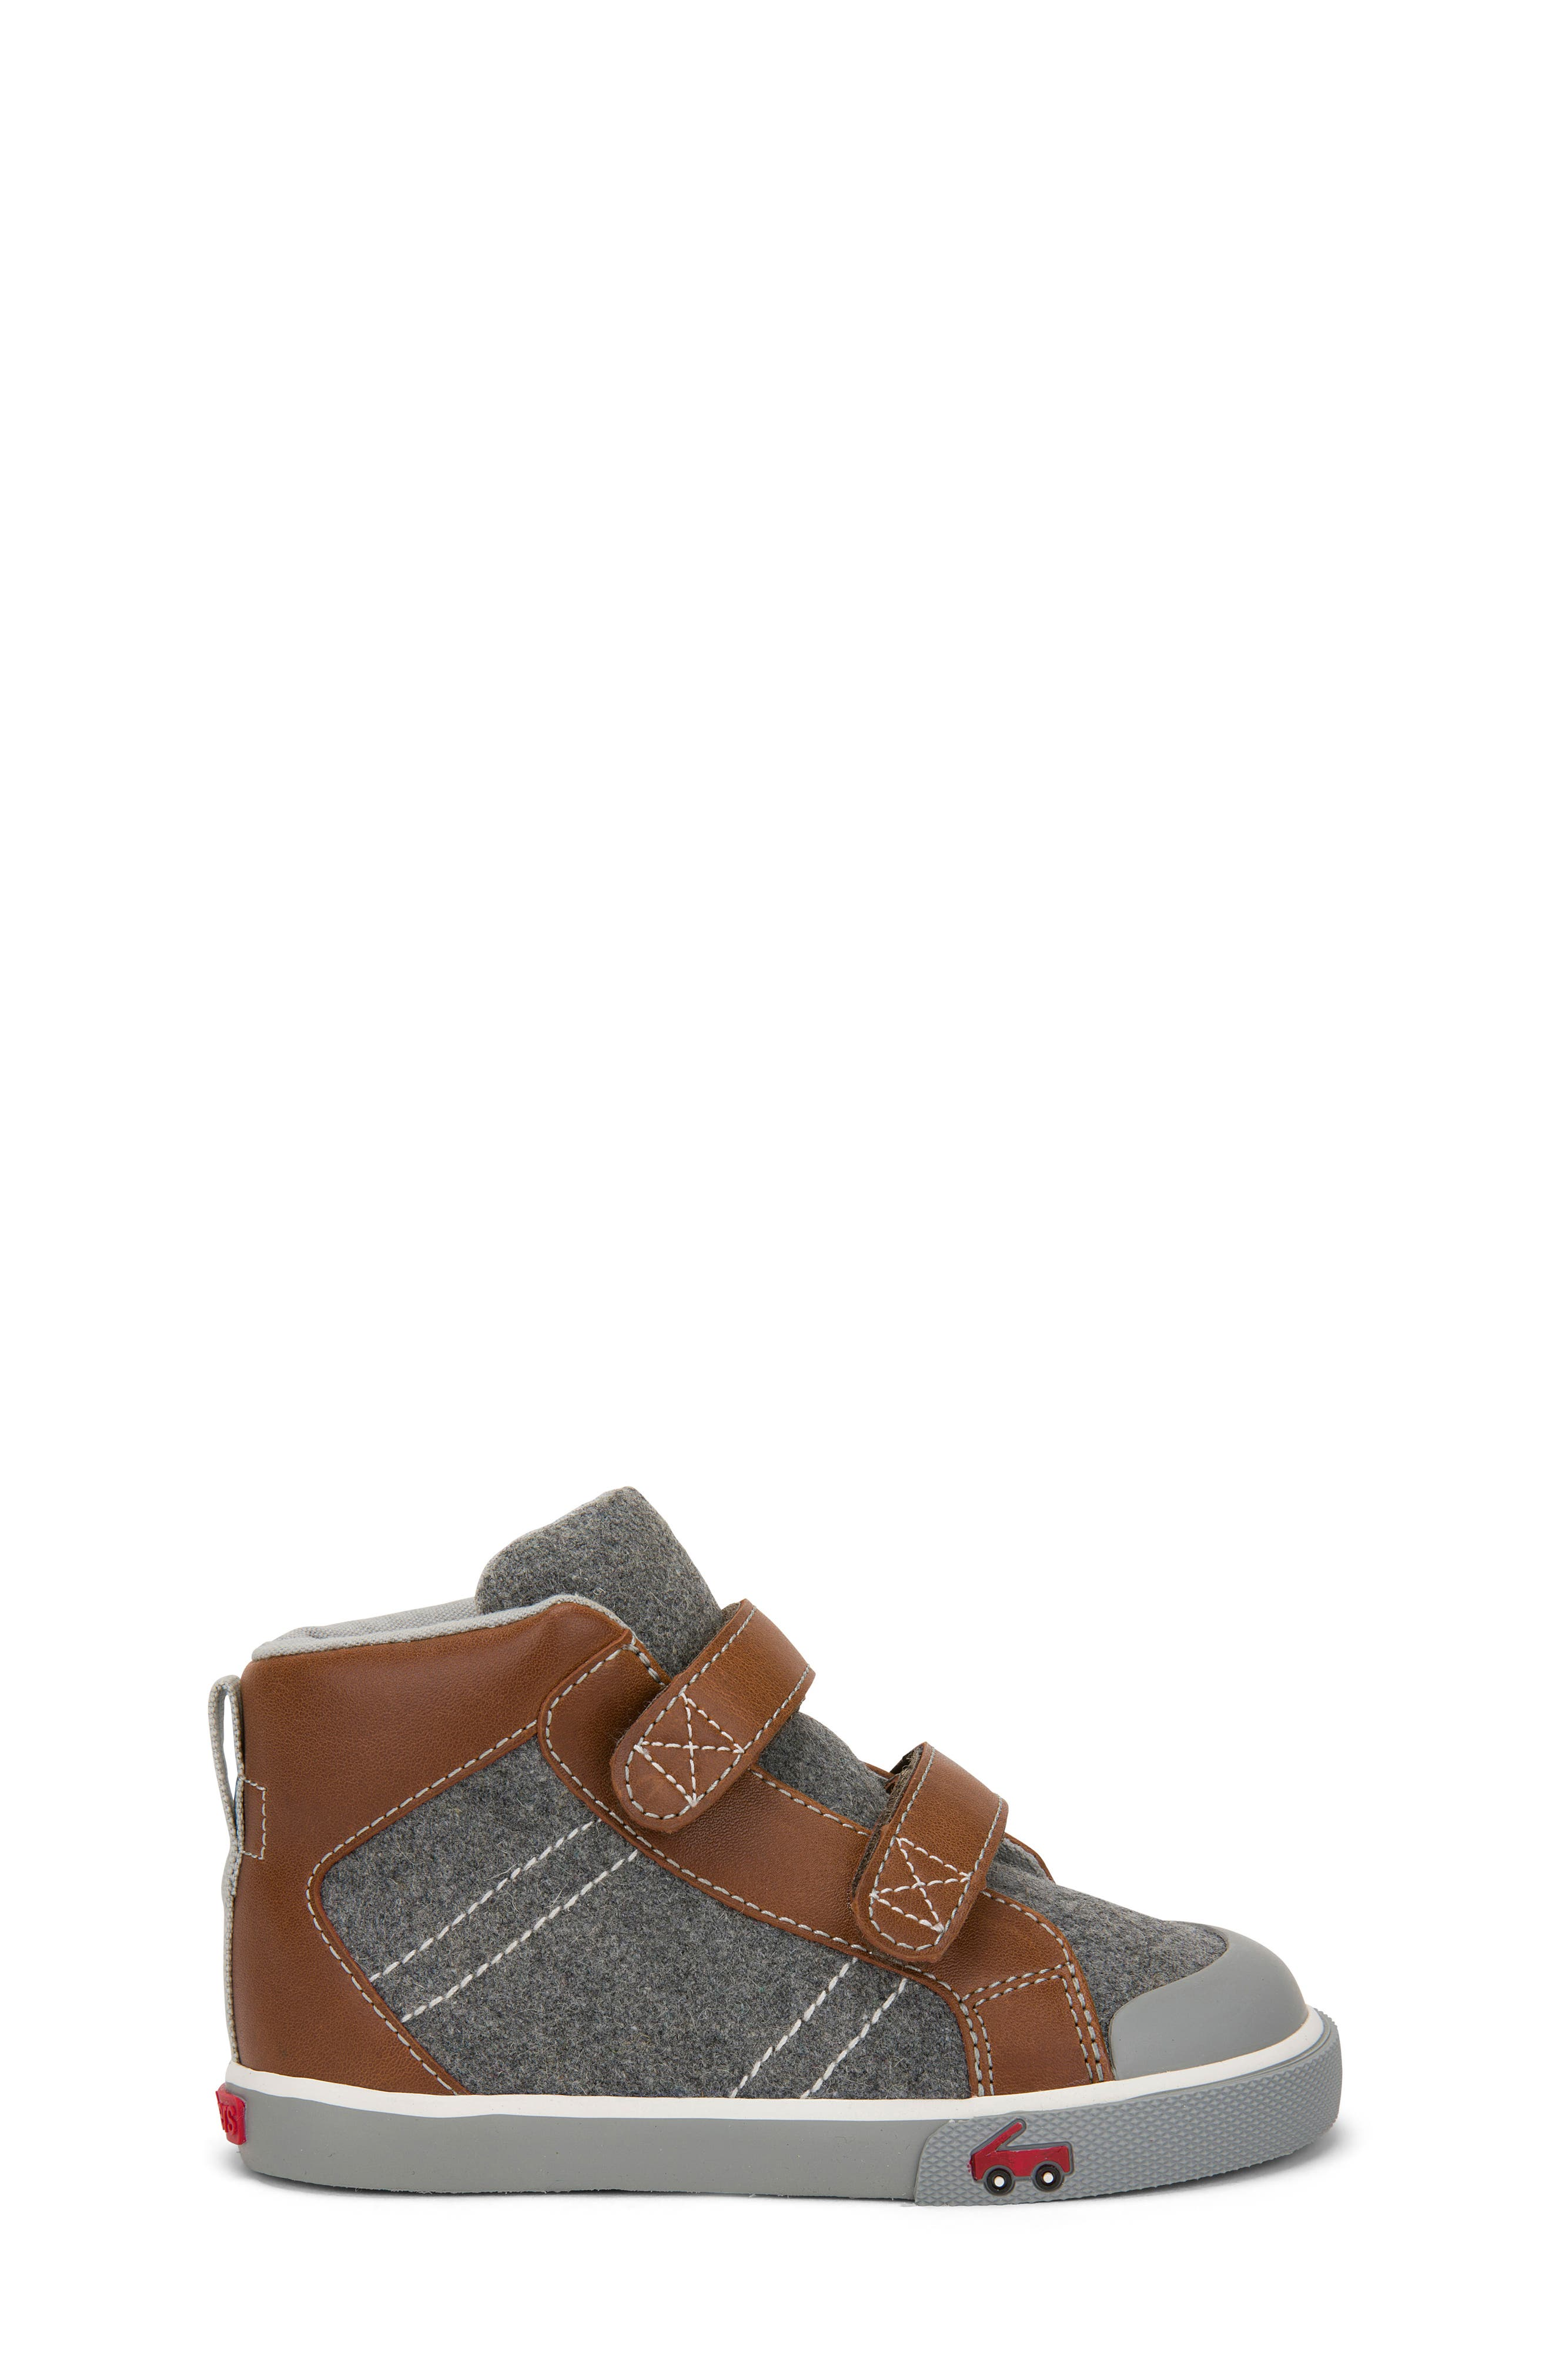 Matty Sneaker,                             Alternate thumbnail 3, color,                             Gray Felt